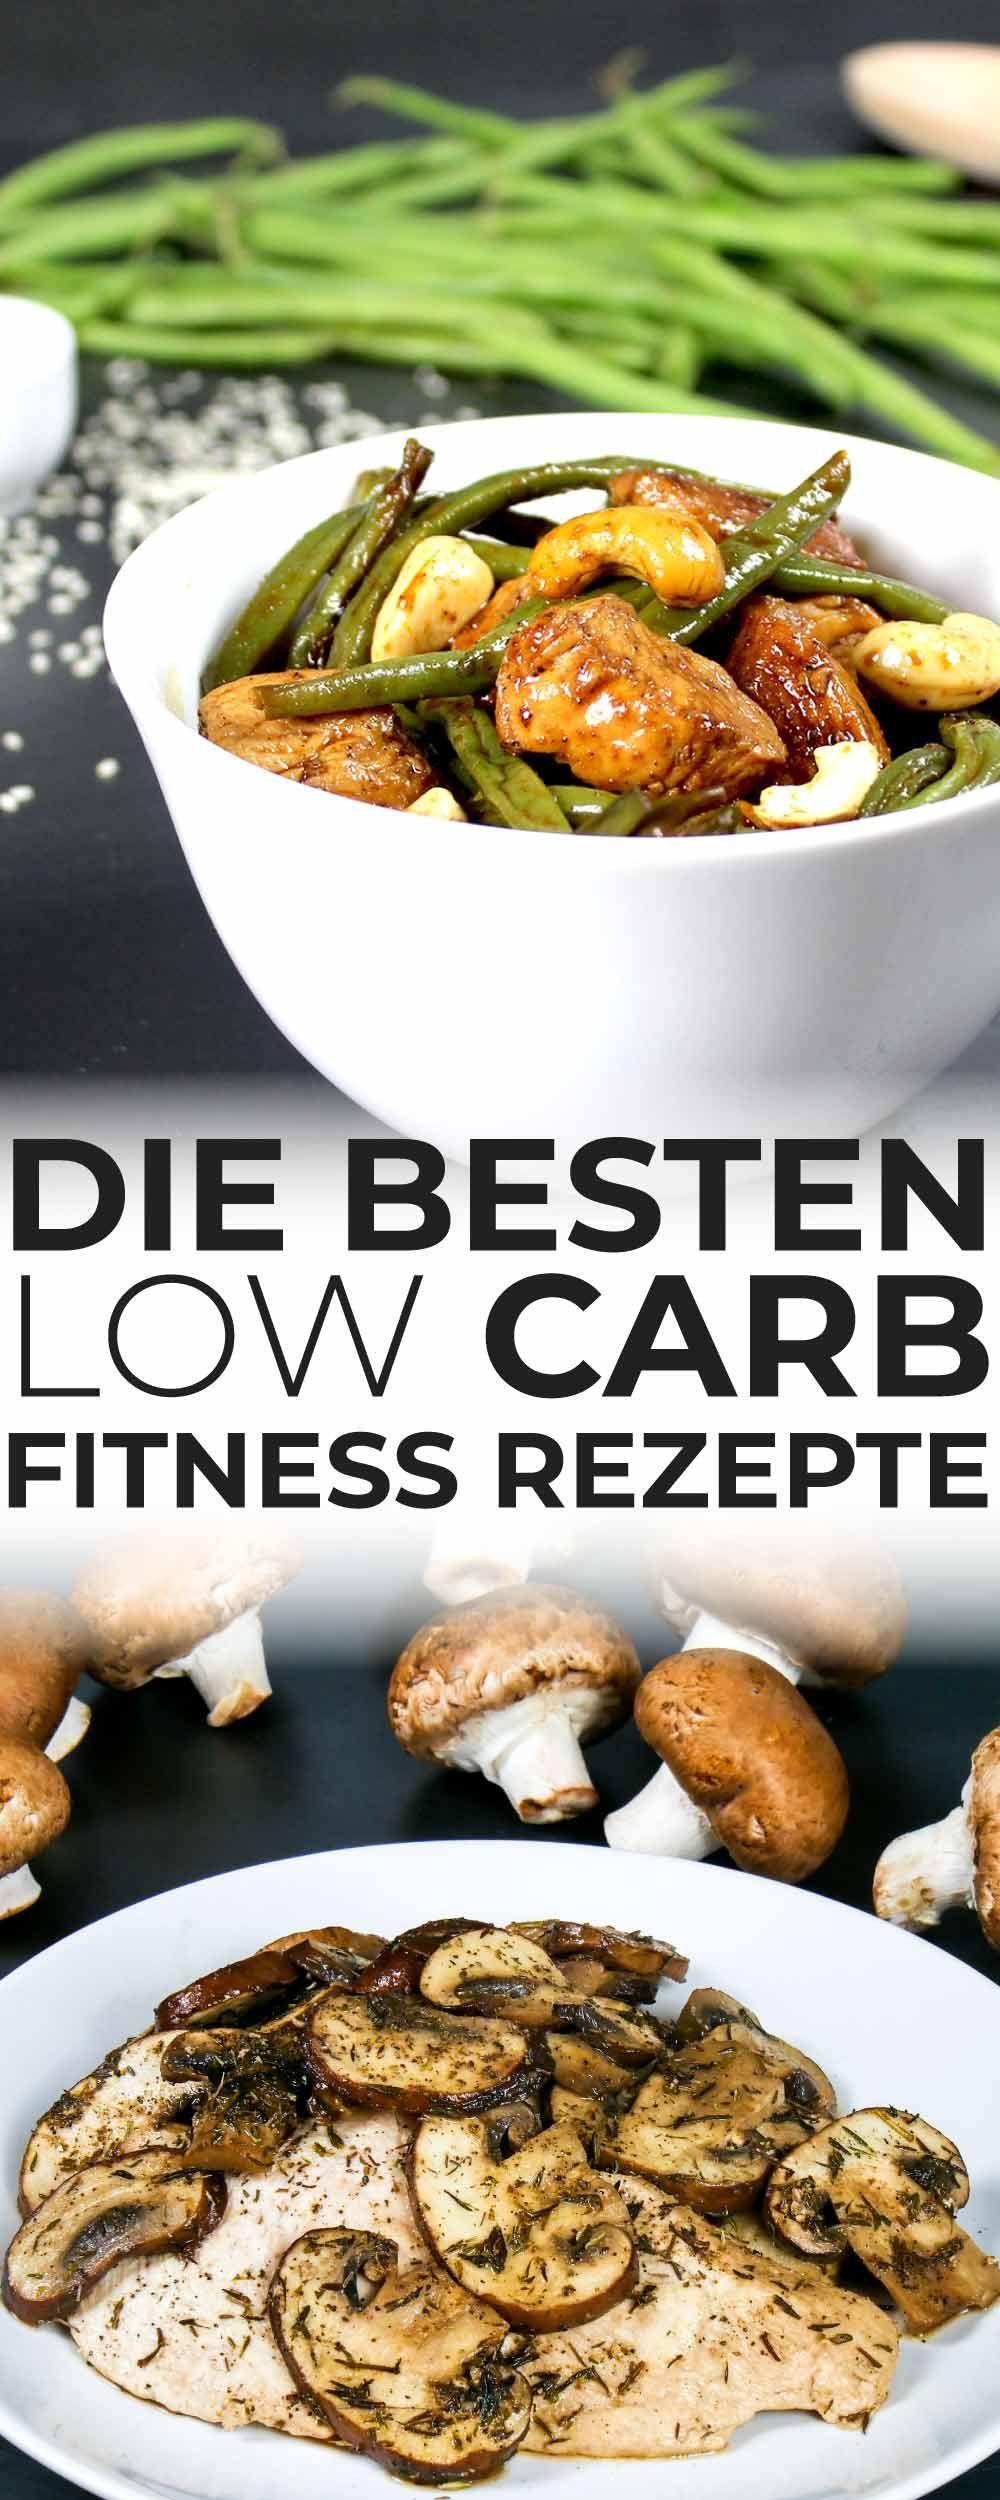 Photo of 14 gesunde Fitness-Rezepte zum Abnehmen (+3 Bonus-Tipps)